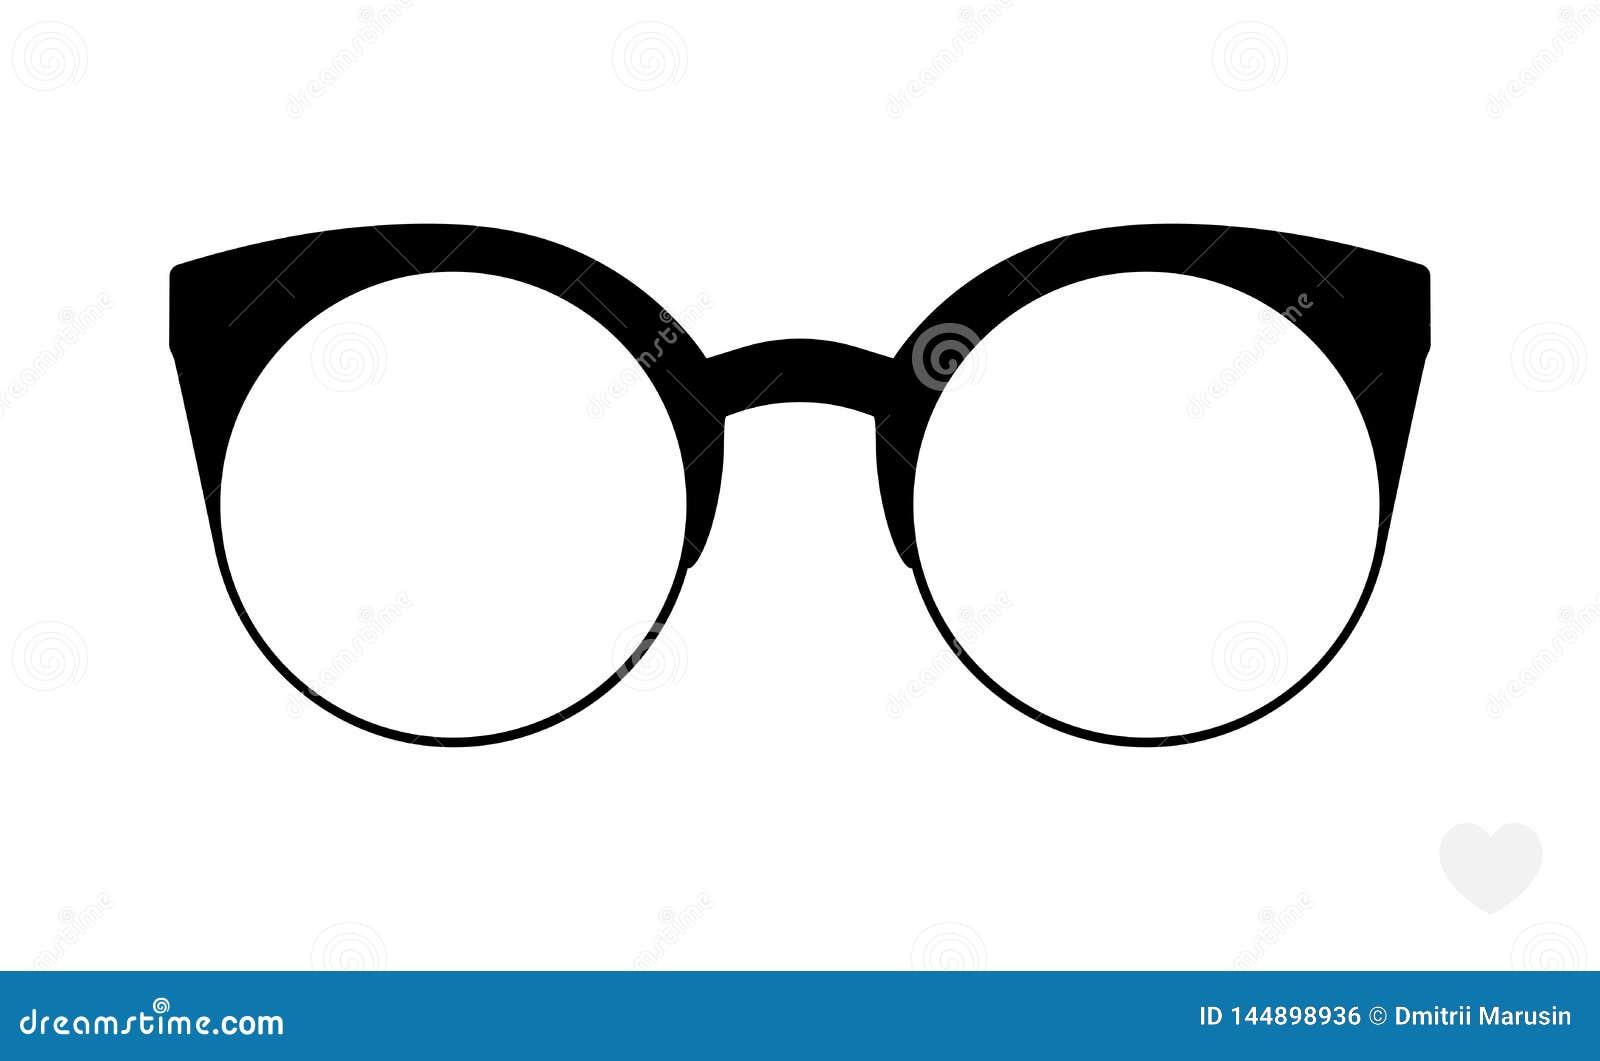 Glasses Vector Accessory Art Black Collection Cool Flat Design Vector Illustration Of Elegan Spectacles In Black Frame White Stock Illustration Illustration Of Background Graphic 144898936